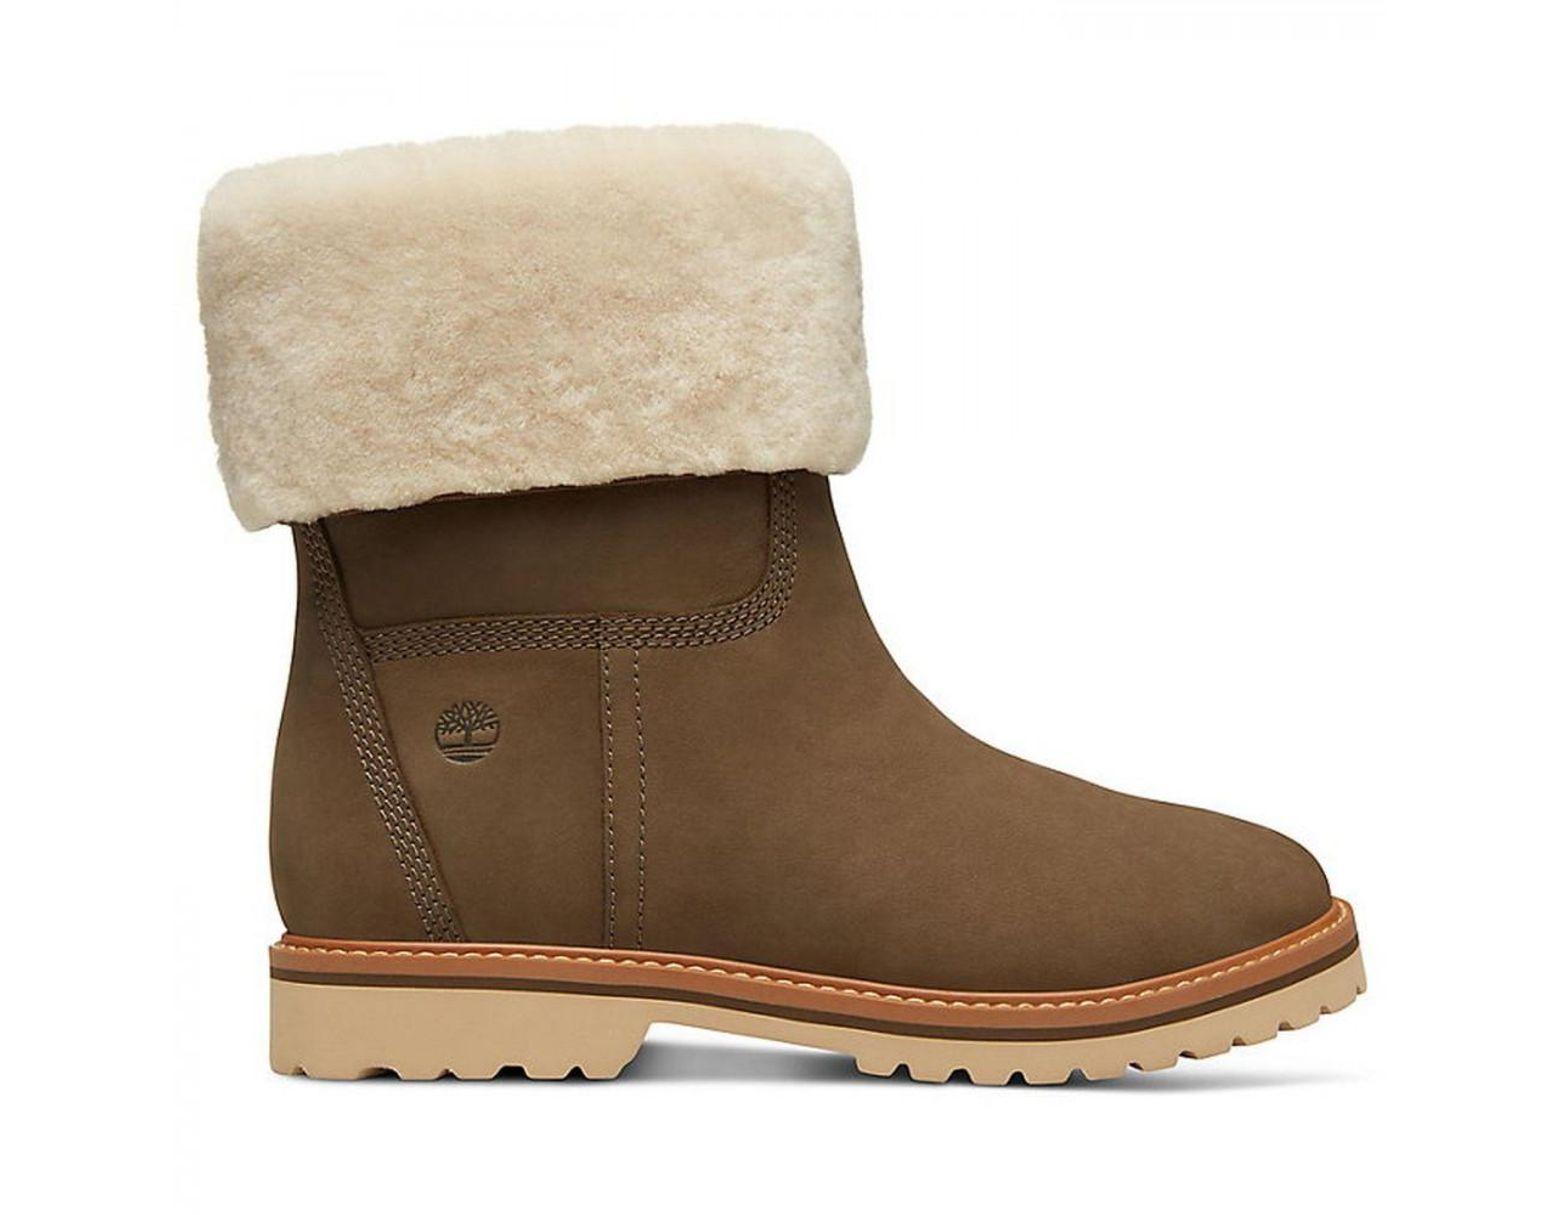 87340dabc1439 Timberland Chamonix Valley Warm Winter Waterproof Snow Boots in Green - Lyst